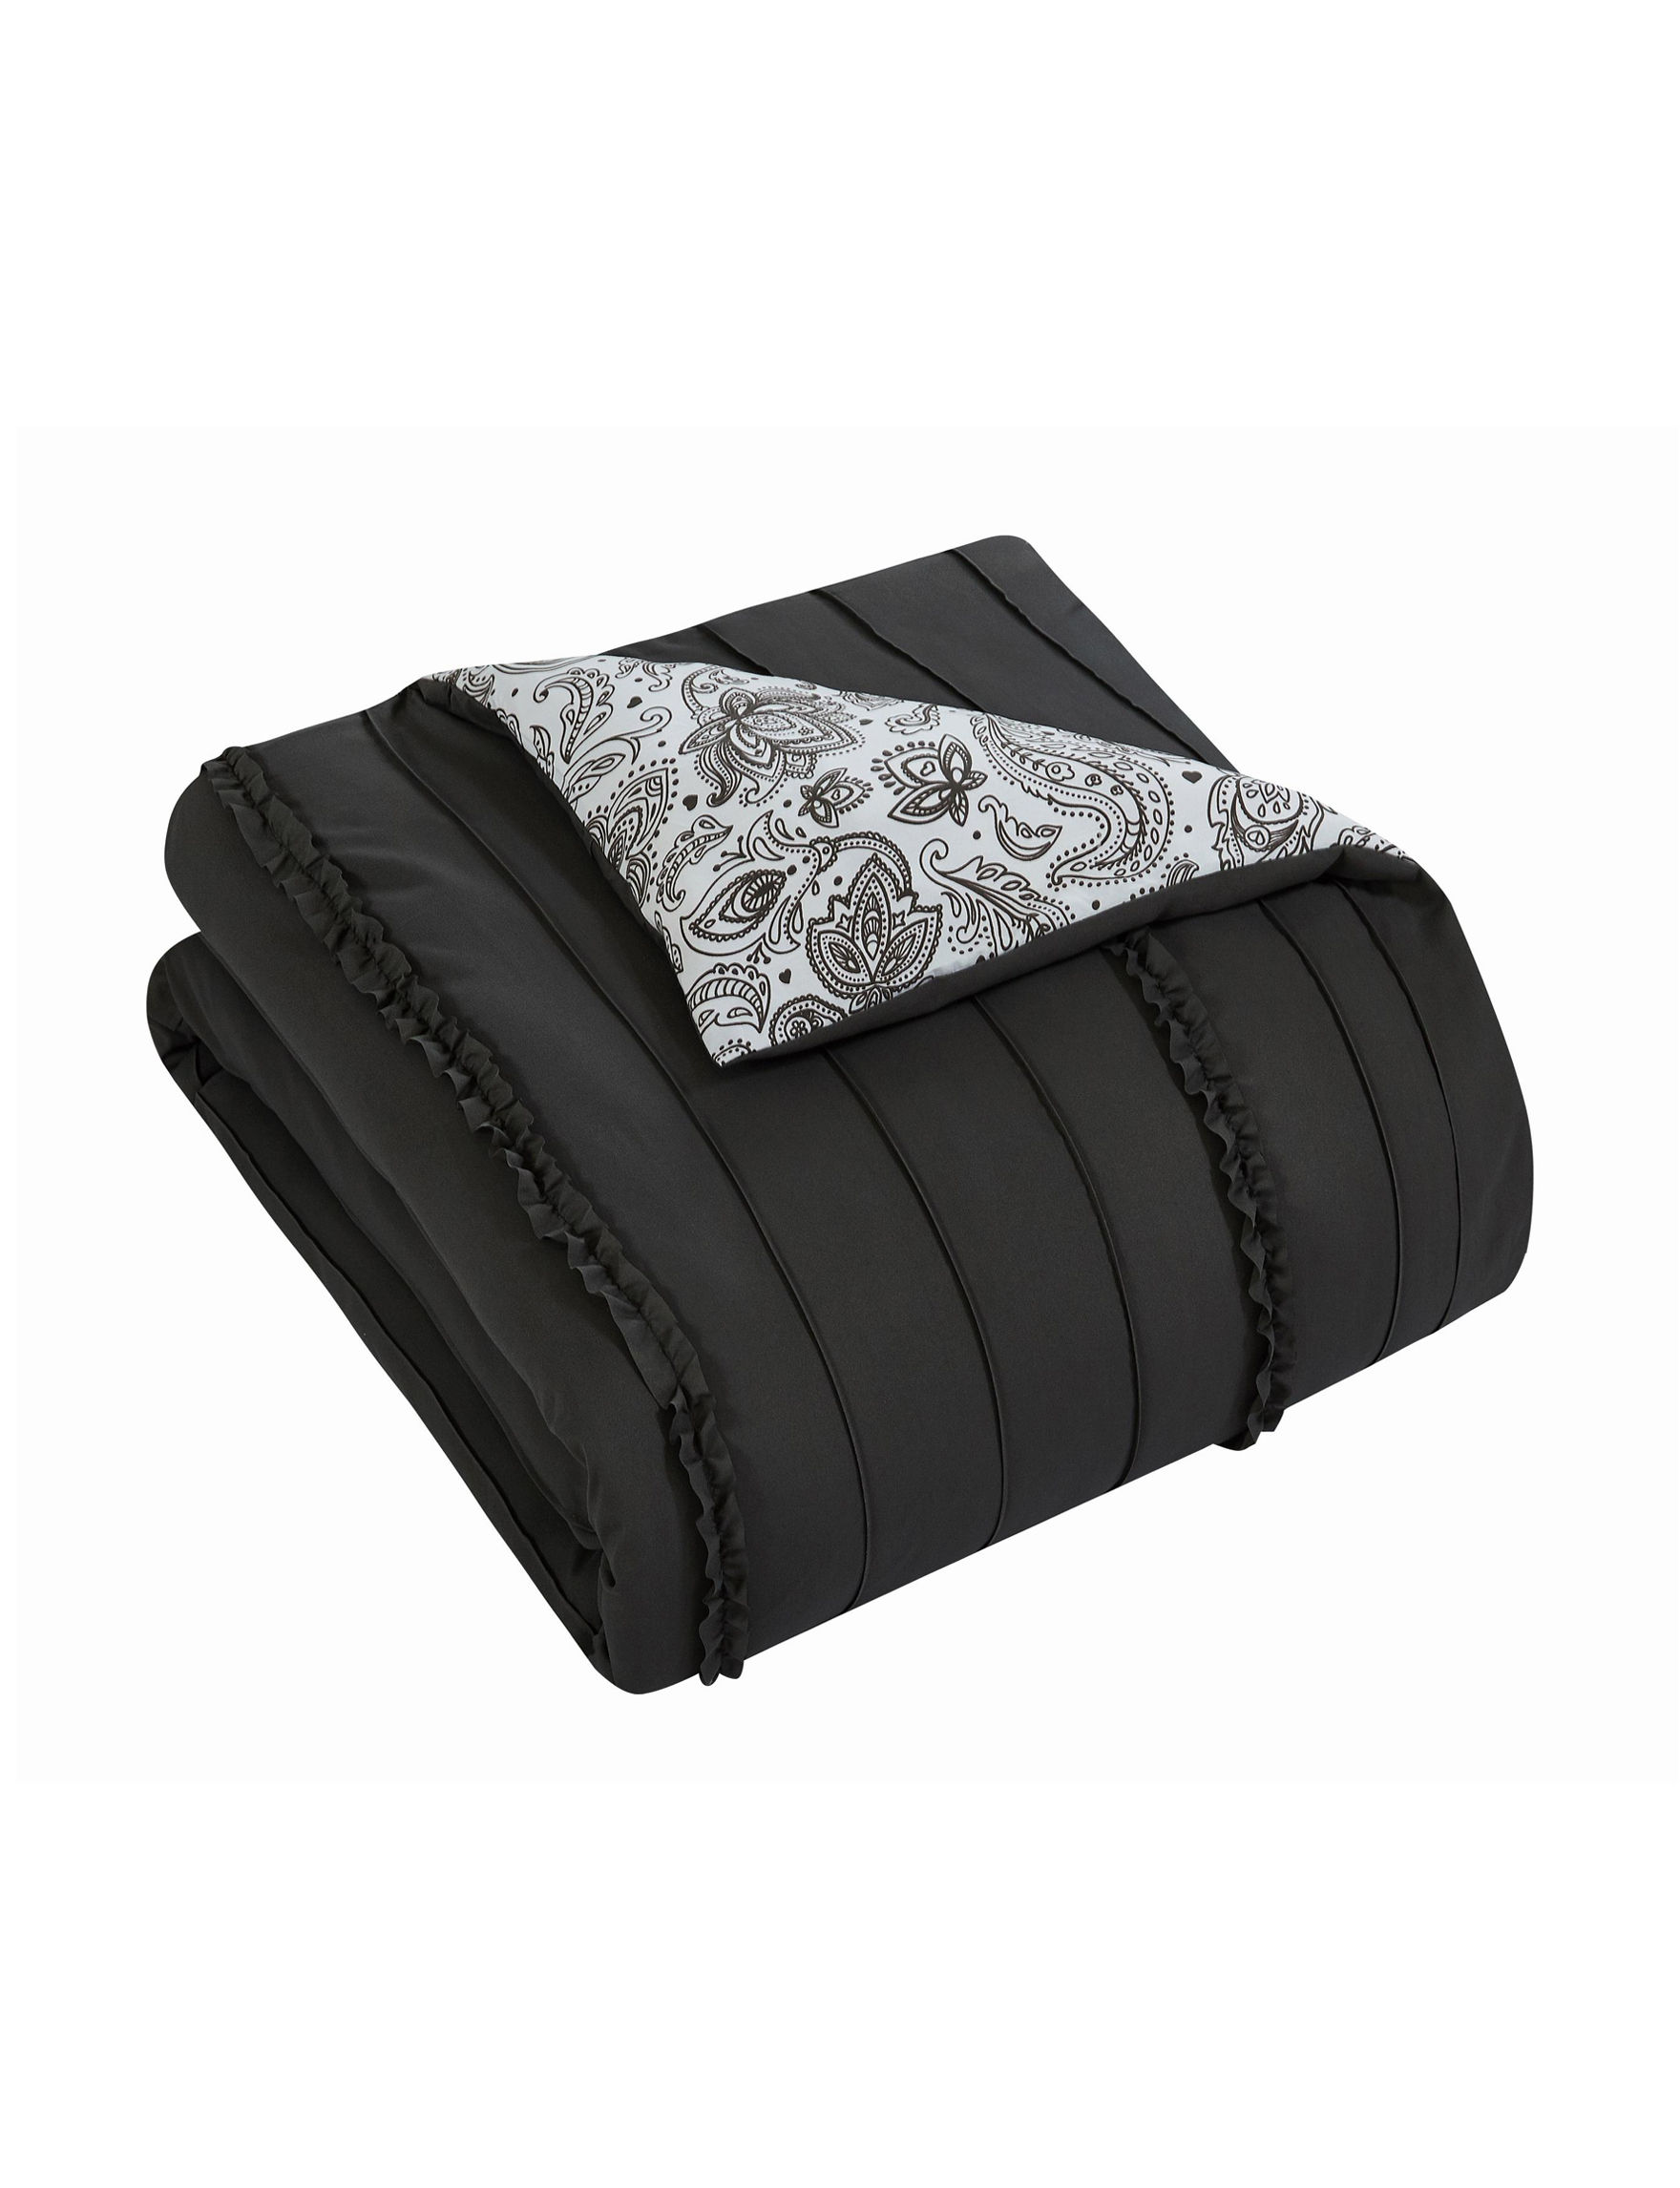 Chic Home Design Grey Comforters & Comforter Sets